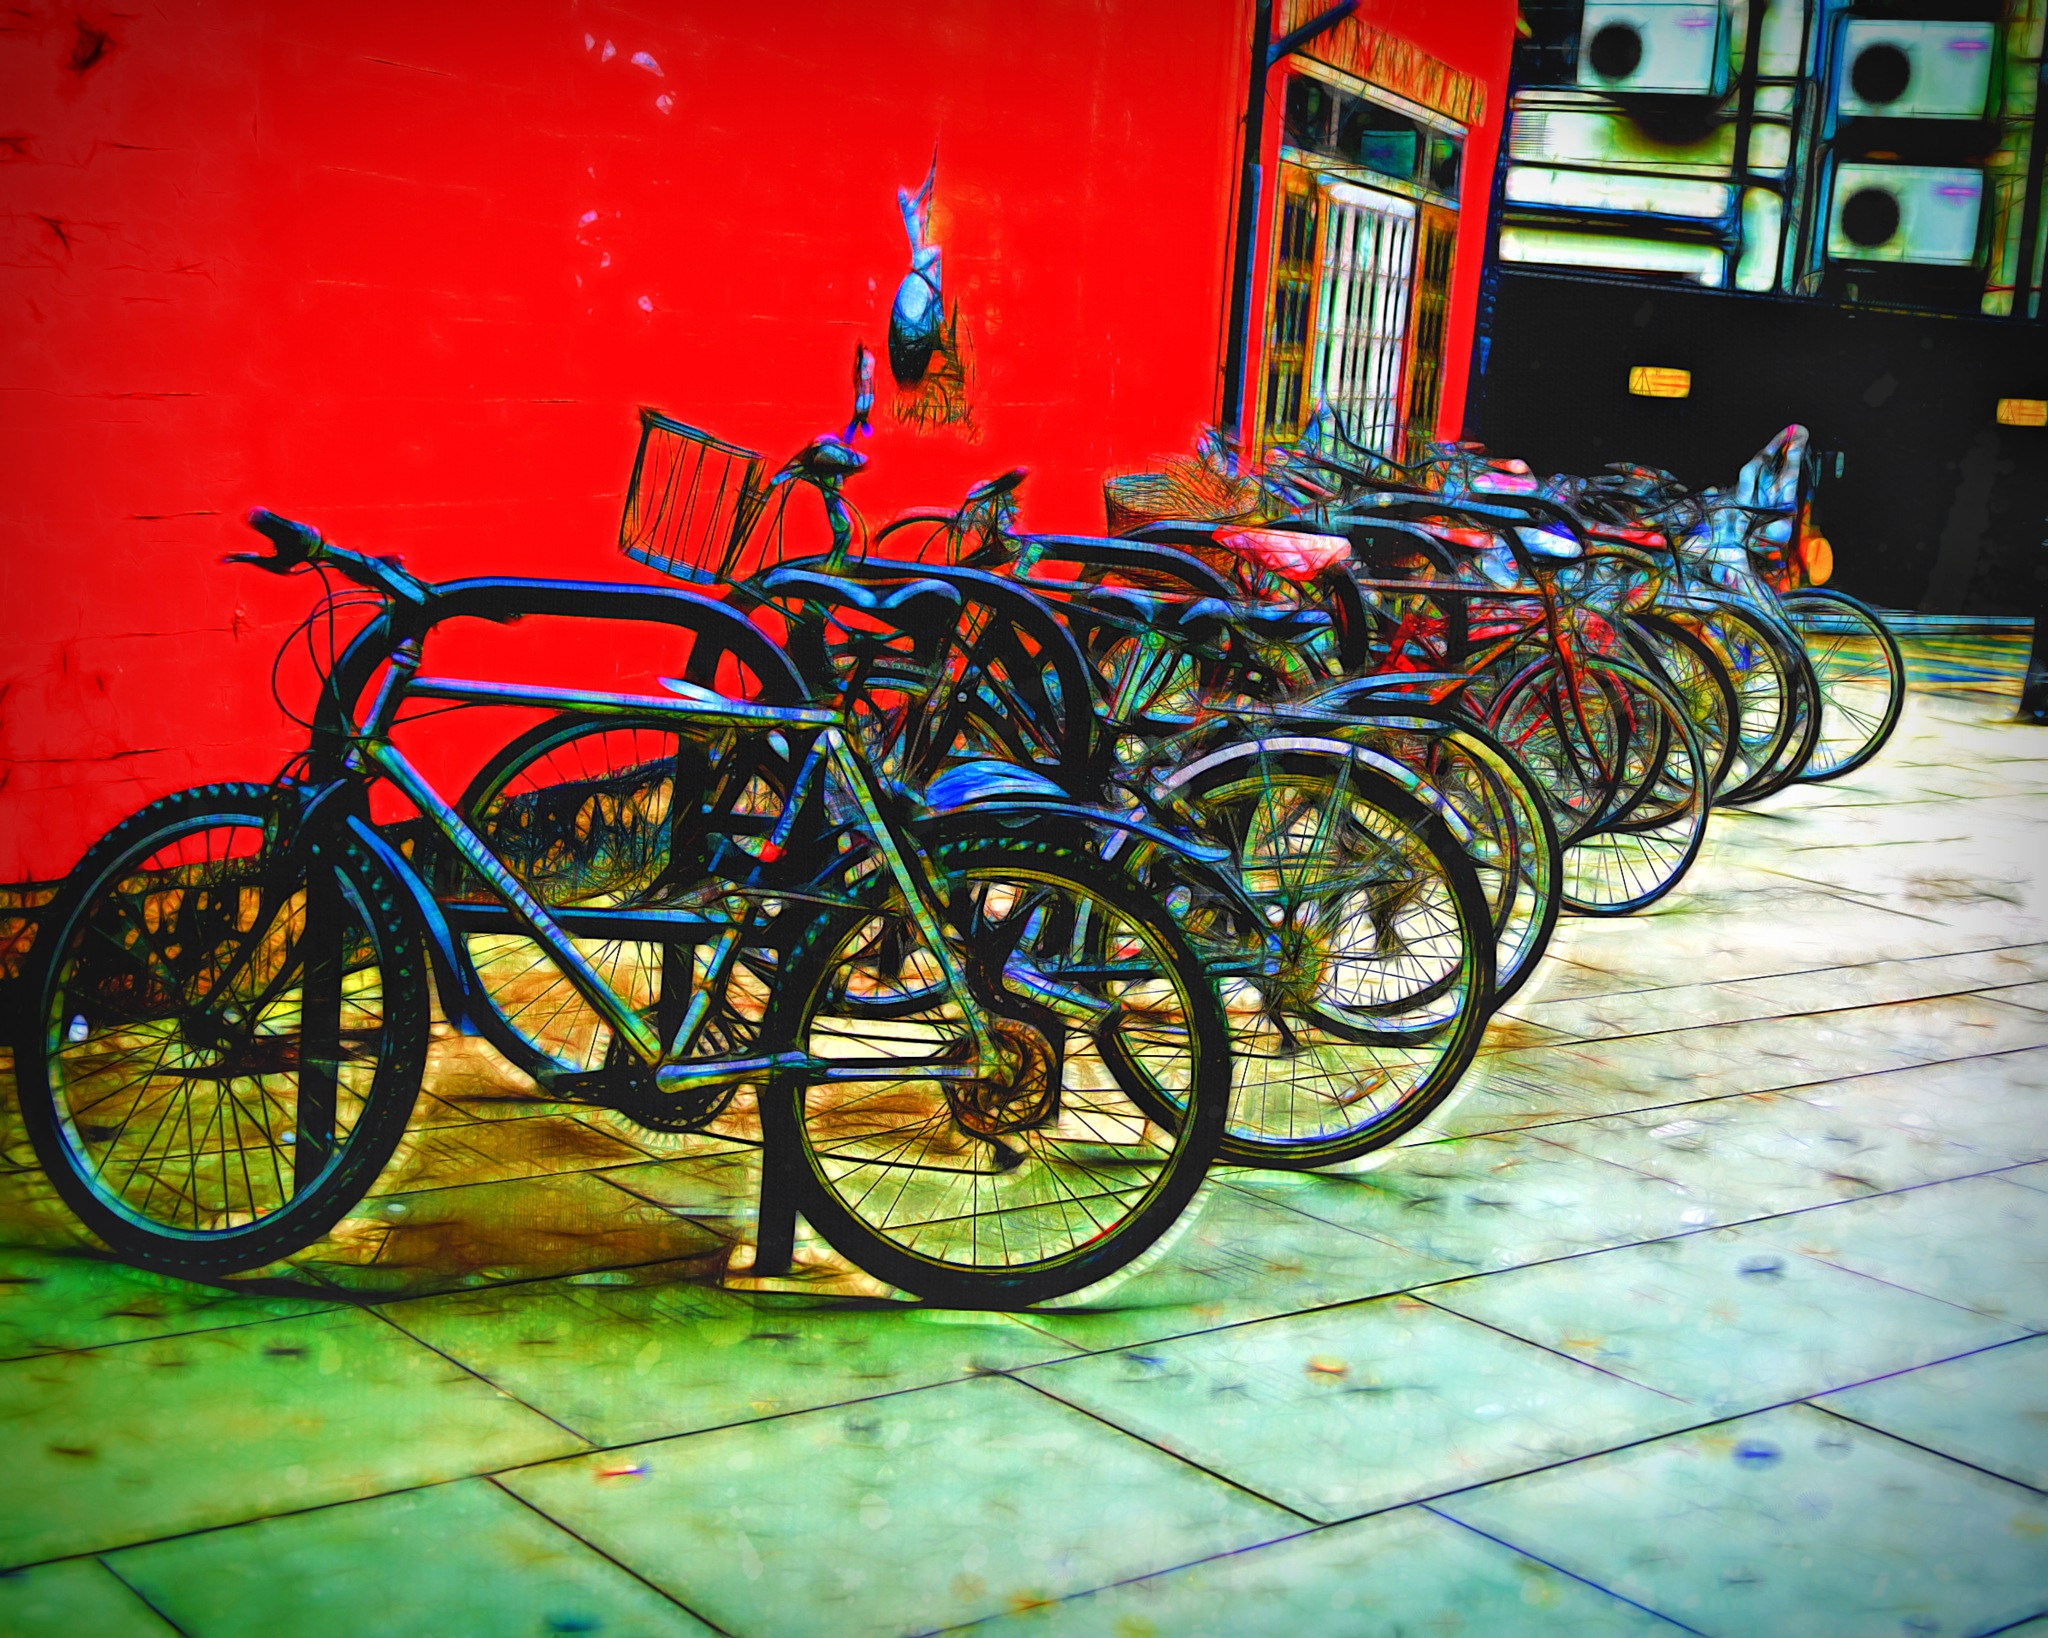 Bike Park by Francisco Colon